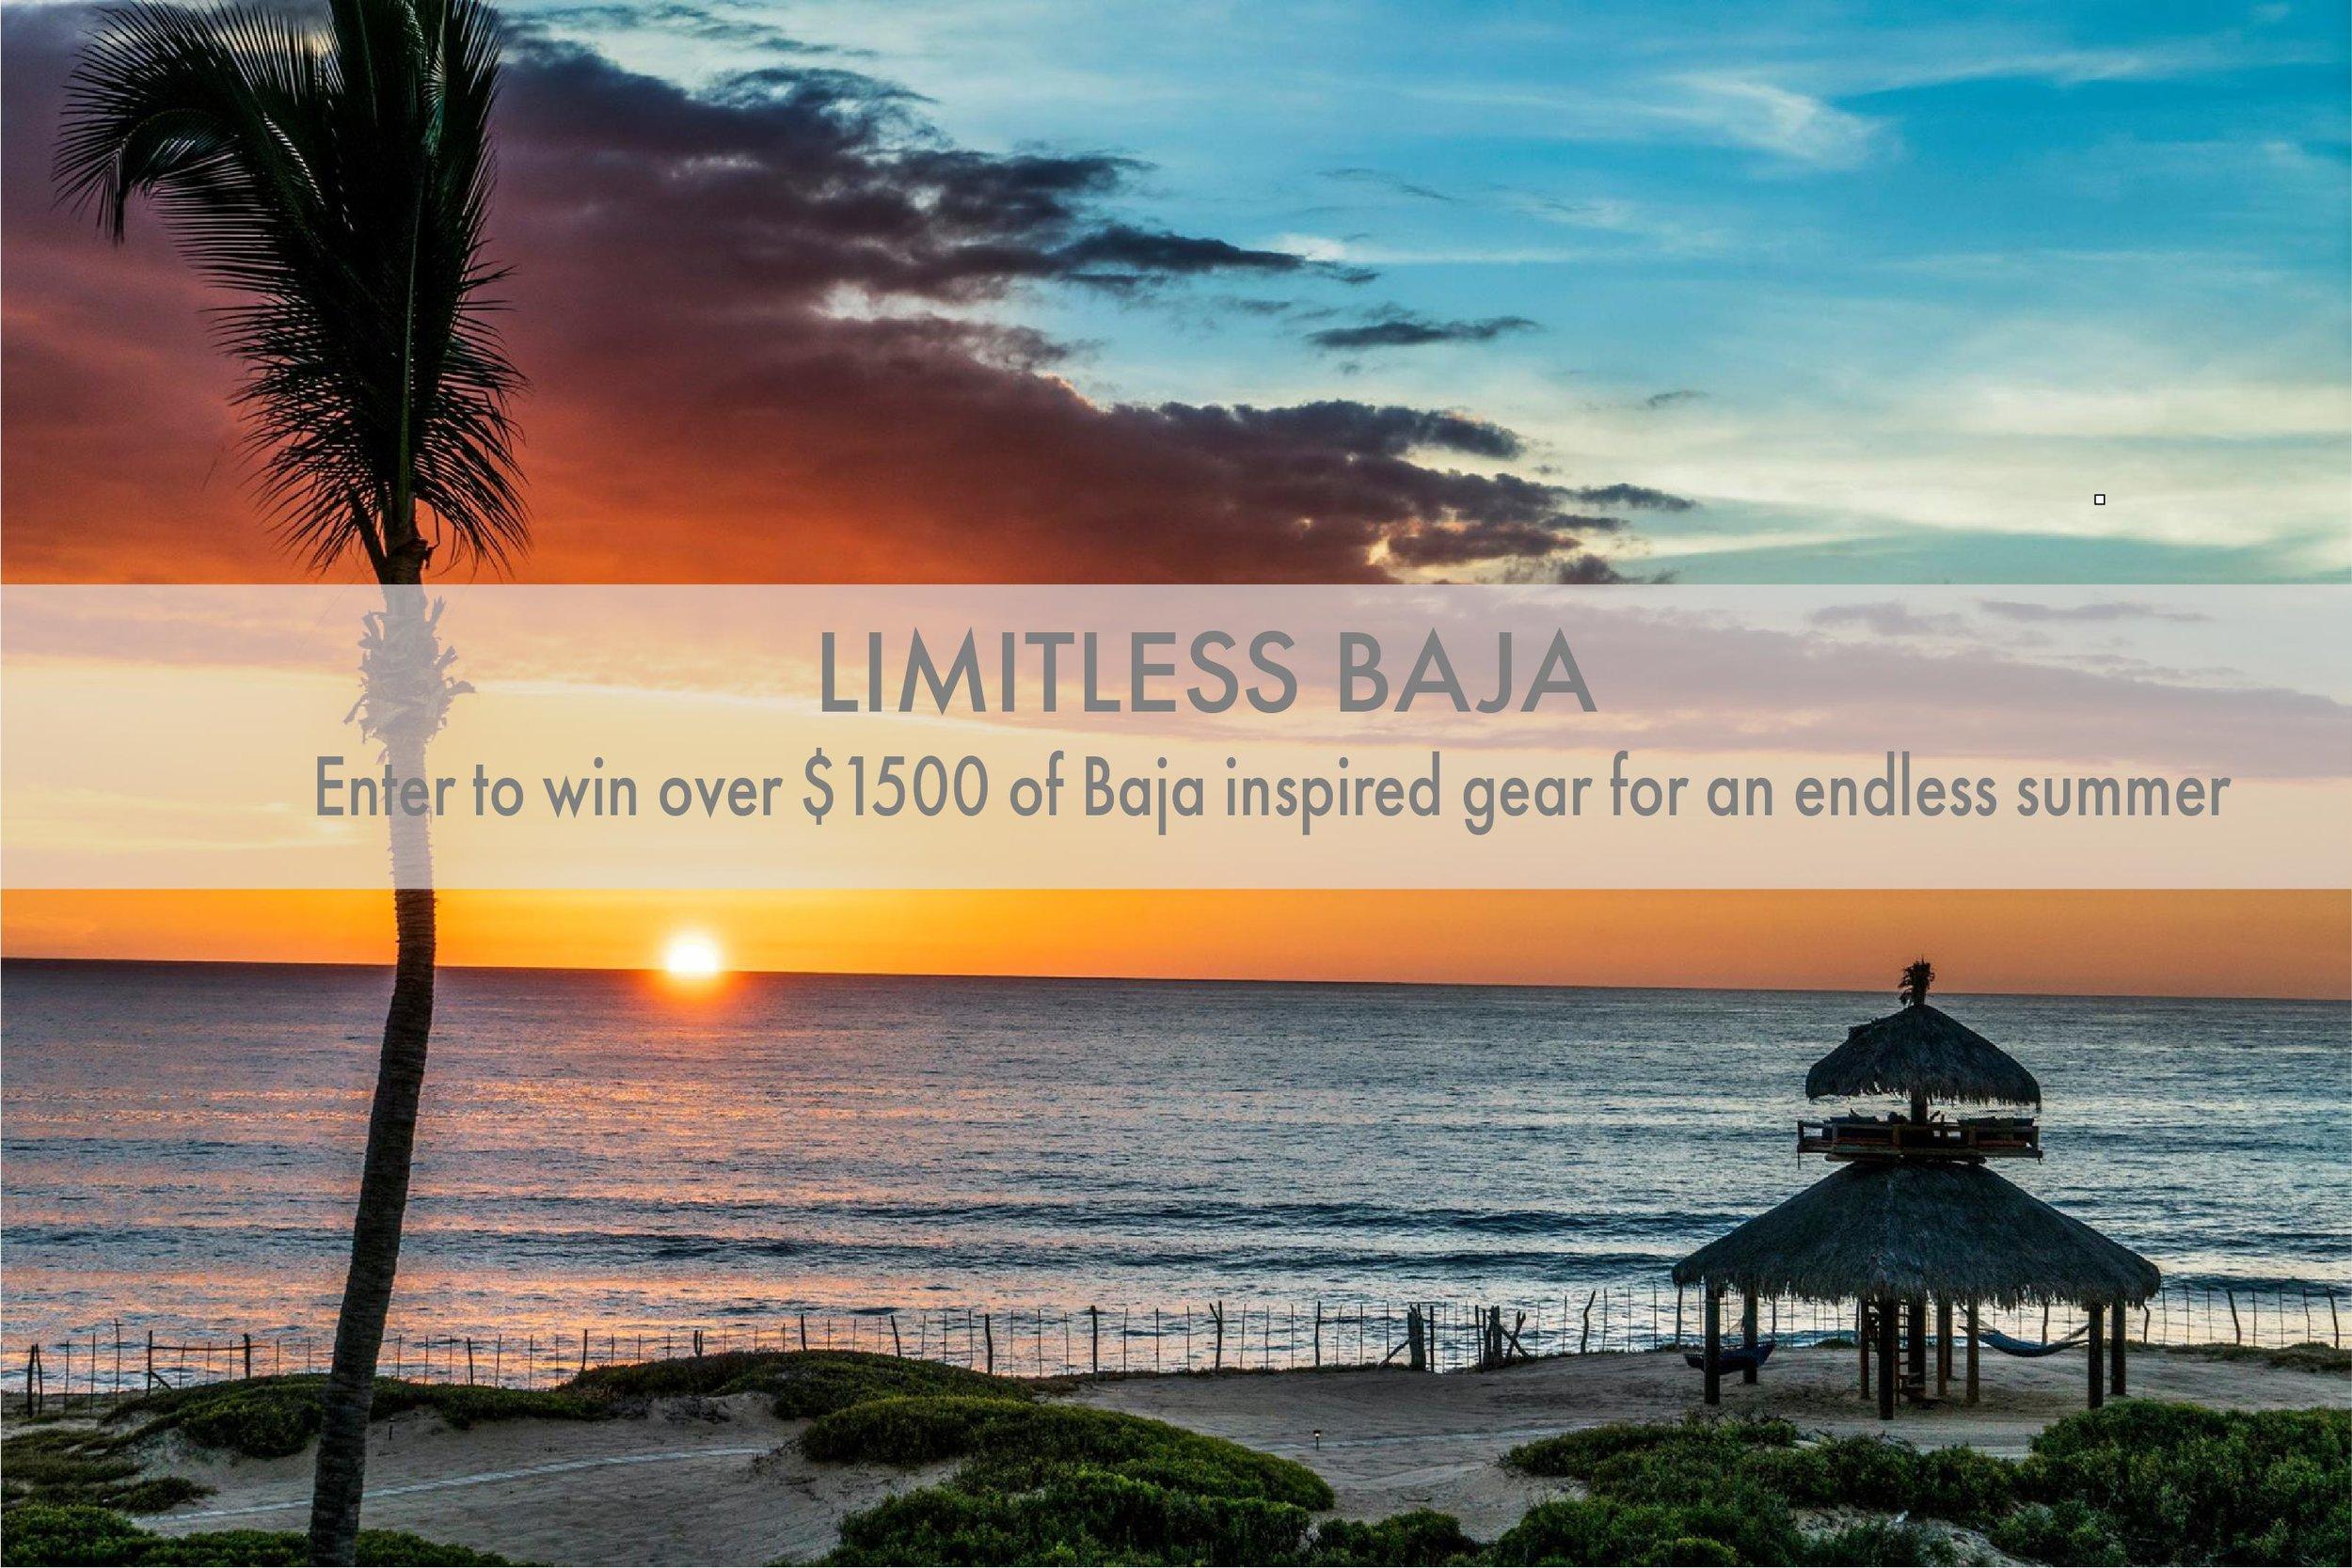 Limitless_Baja_3.jpg